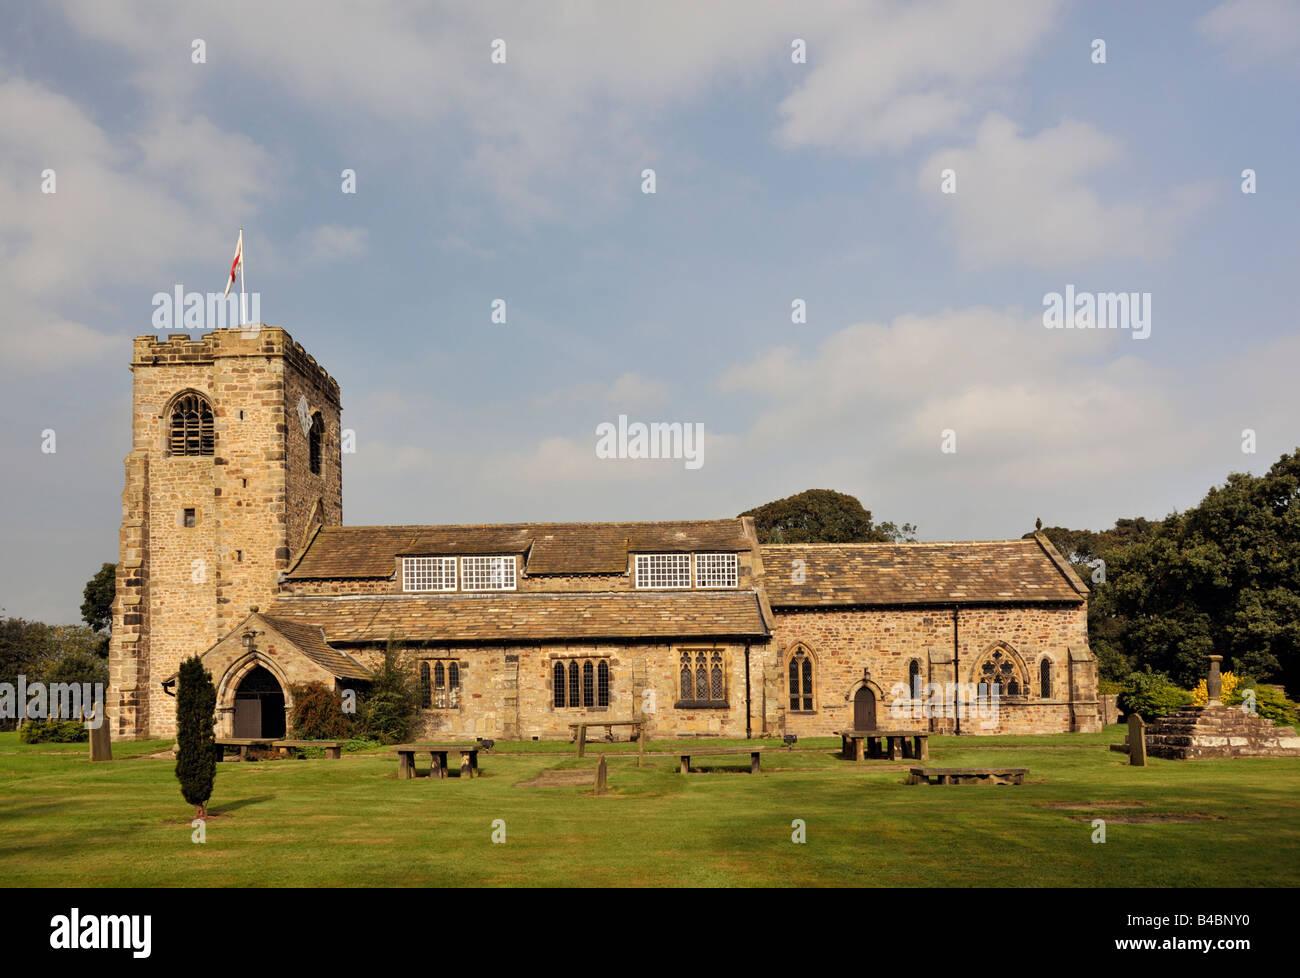 Church of Saint Wilfrid, Ribchester, Lancashire, England, United Kingdom, Europe. - Stock Image